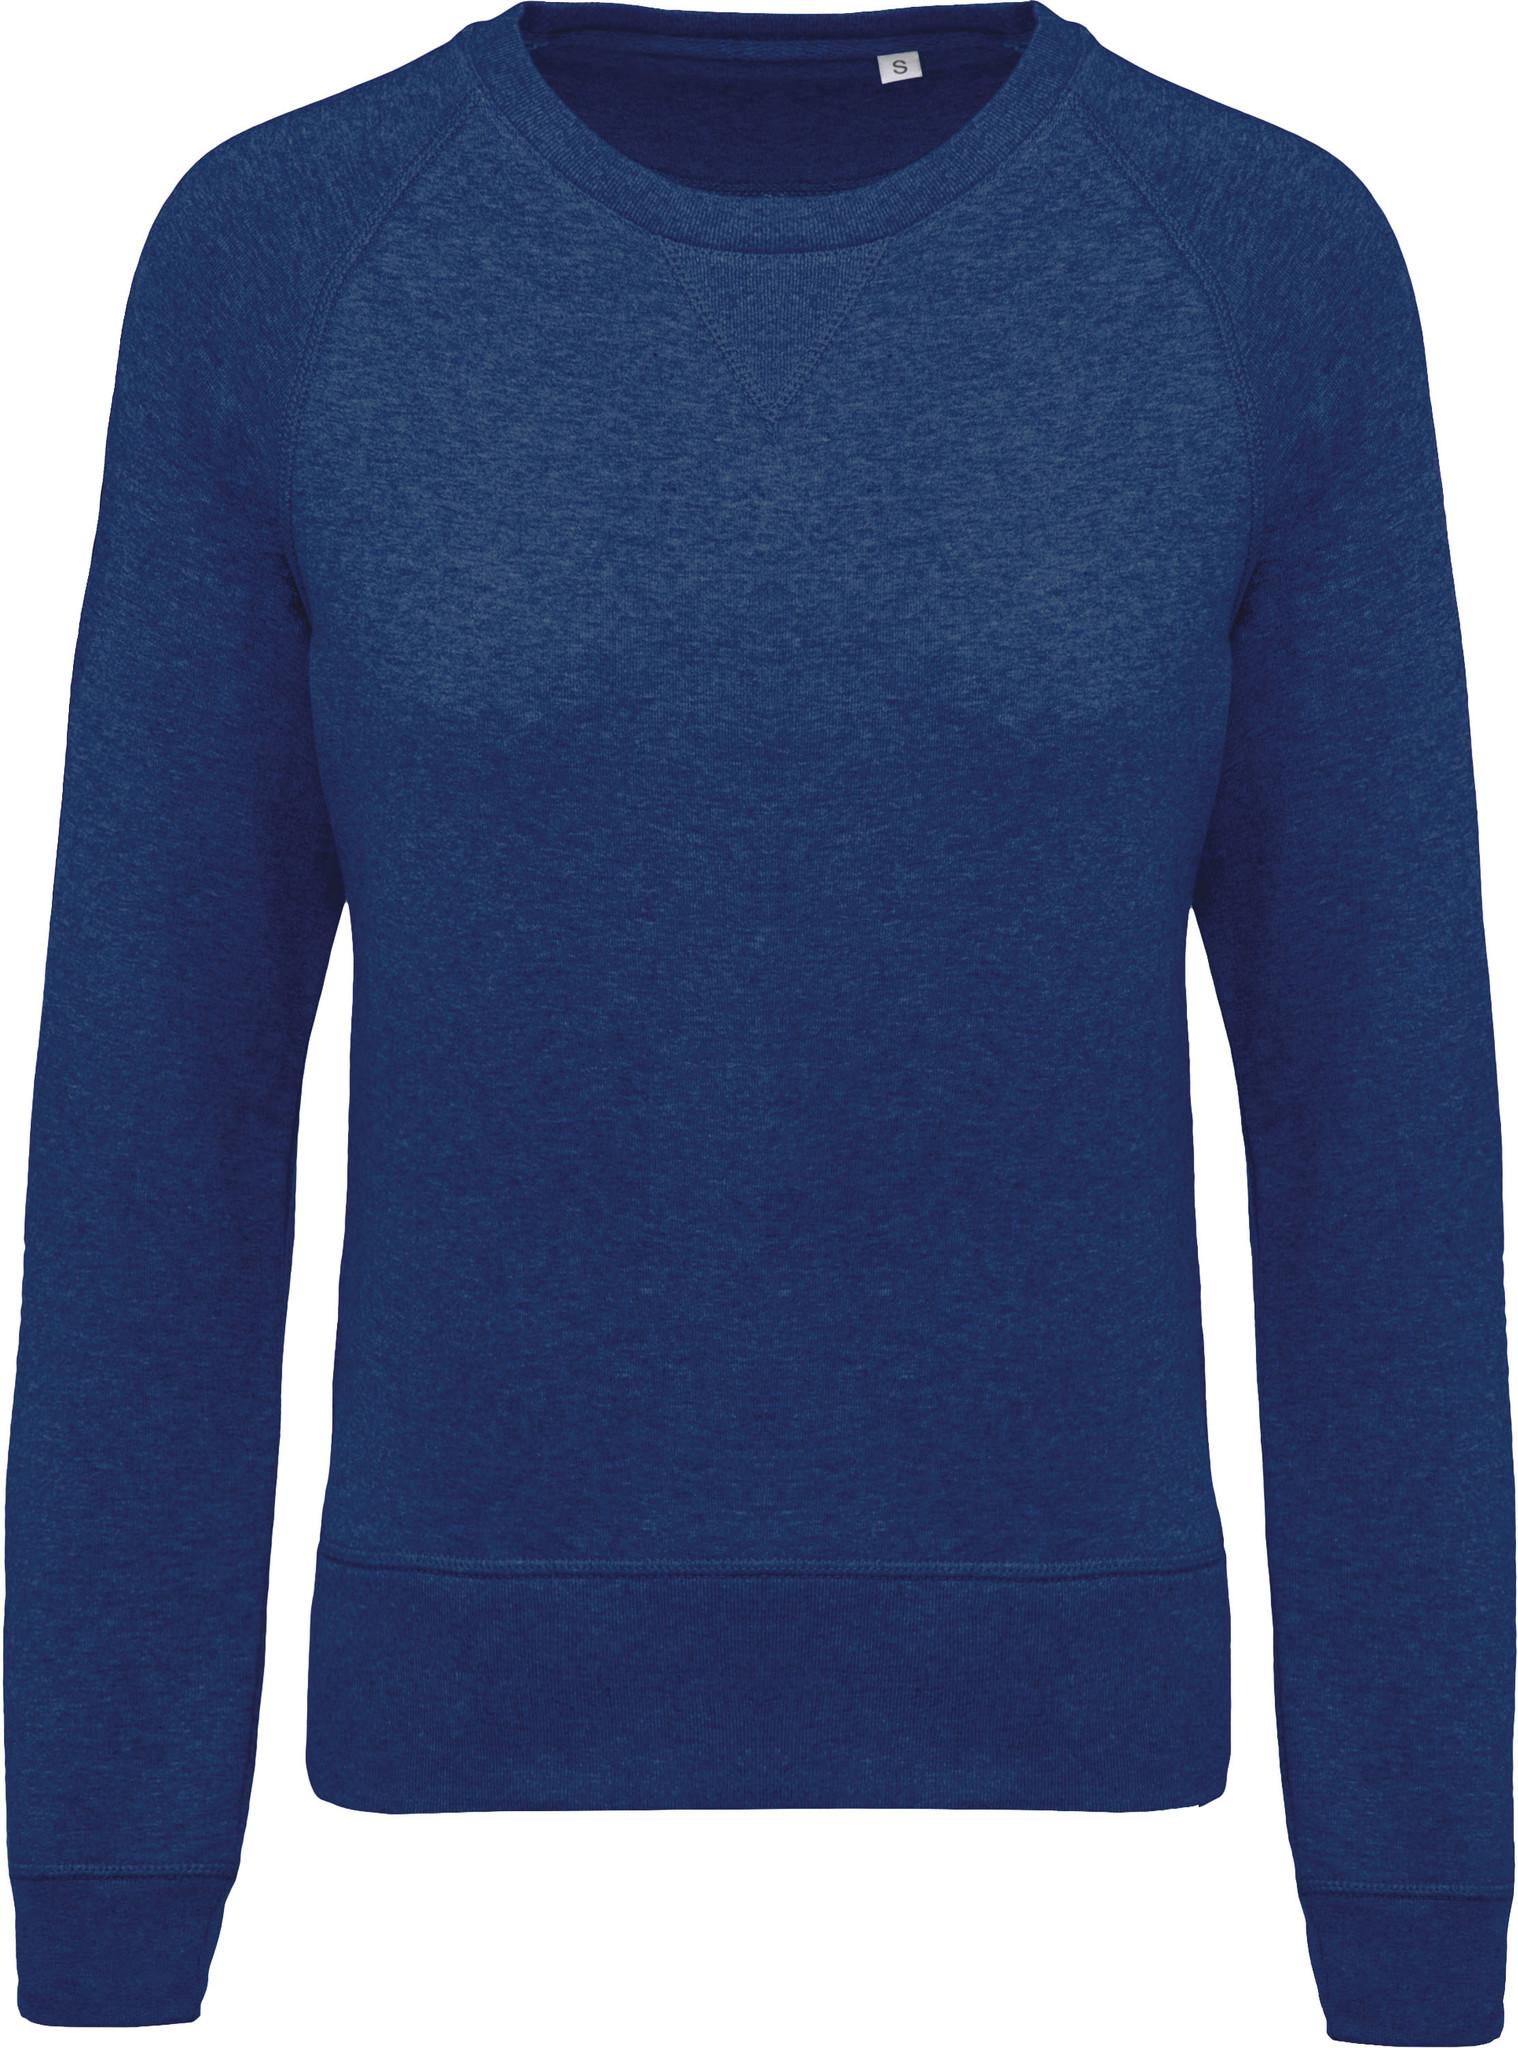 Eco-Friendly Sweater Dames Ocean blue-Gemêleerd